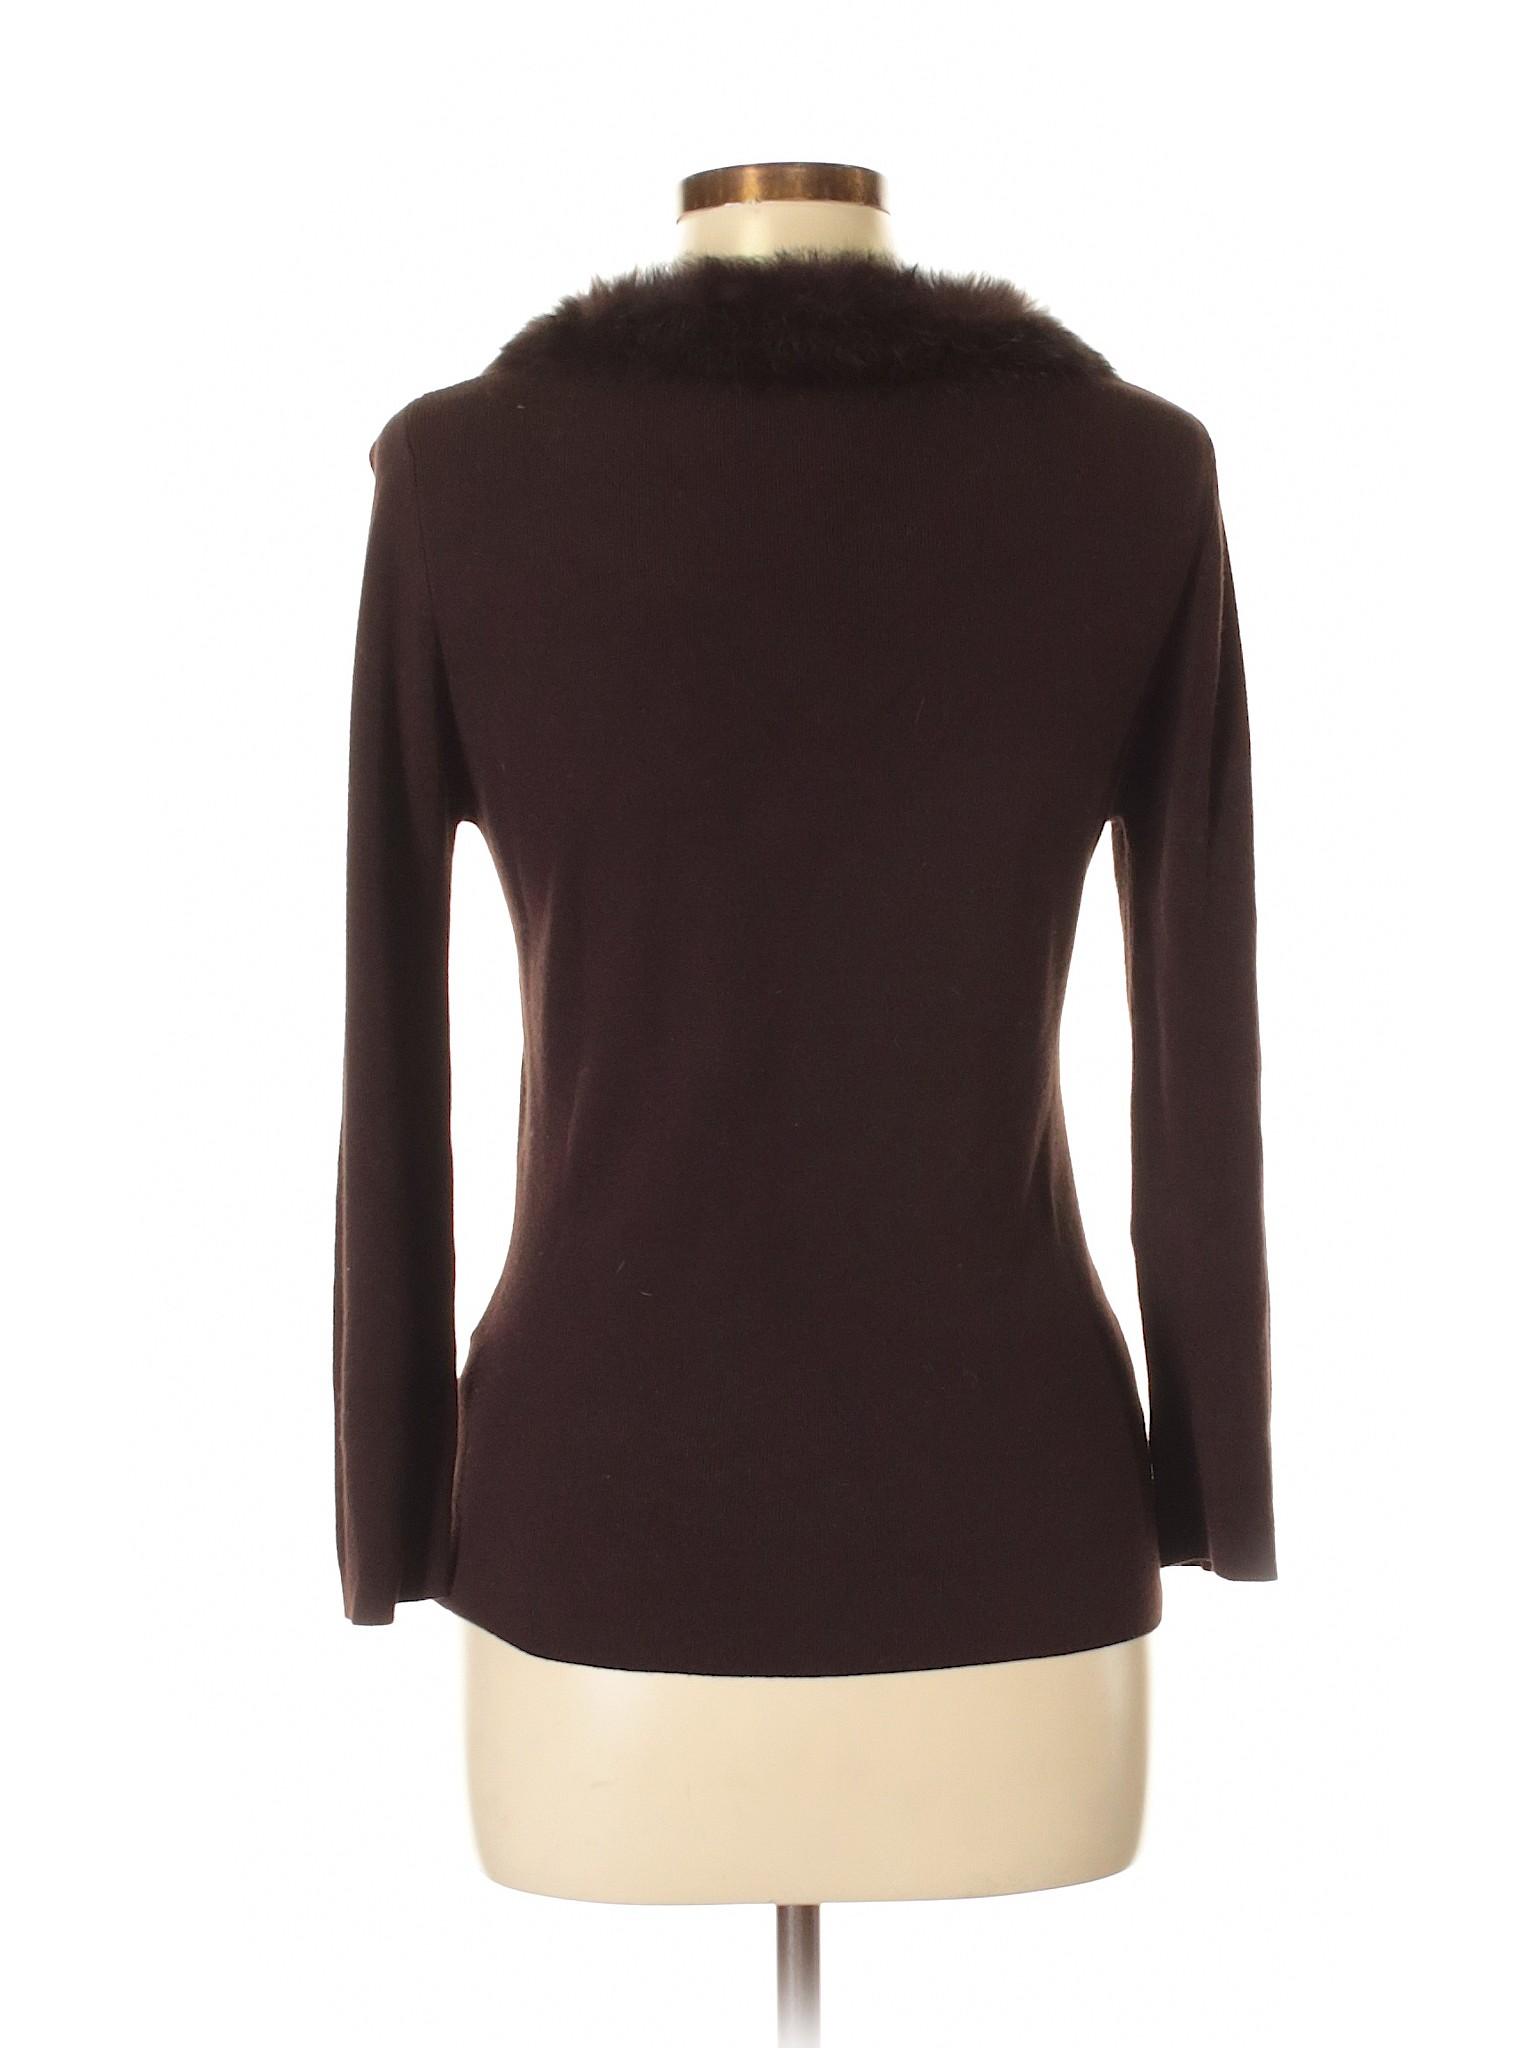 Boutique Pullover Nicole Nicole Boutique Pullover Michelle Michelle Boutique Sweater Sweater Michelle Z1XfaO